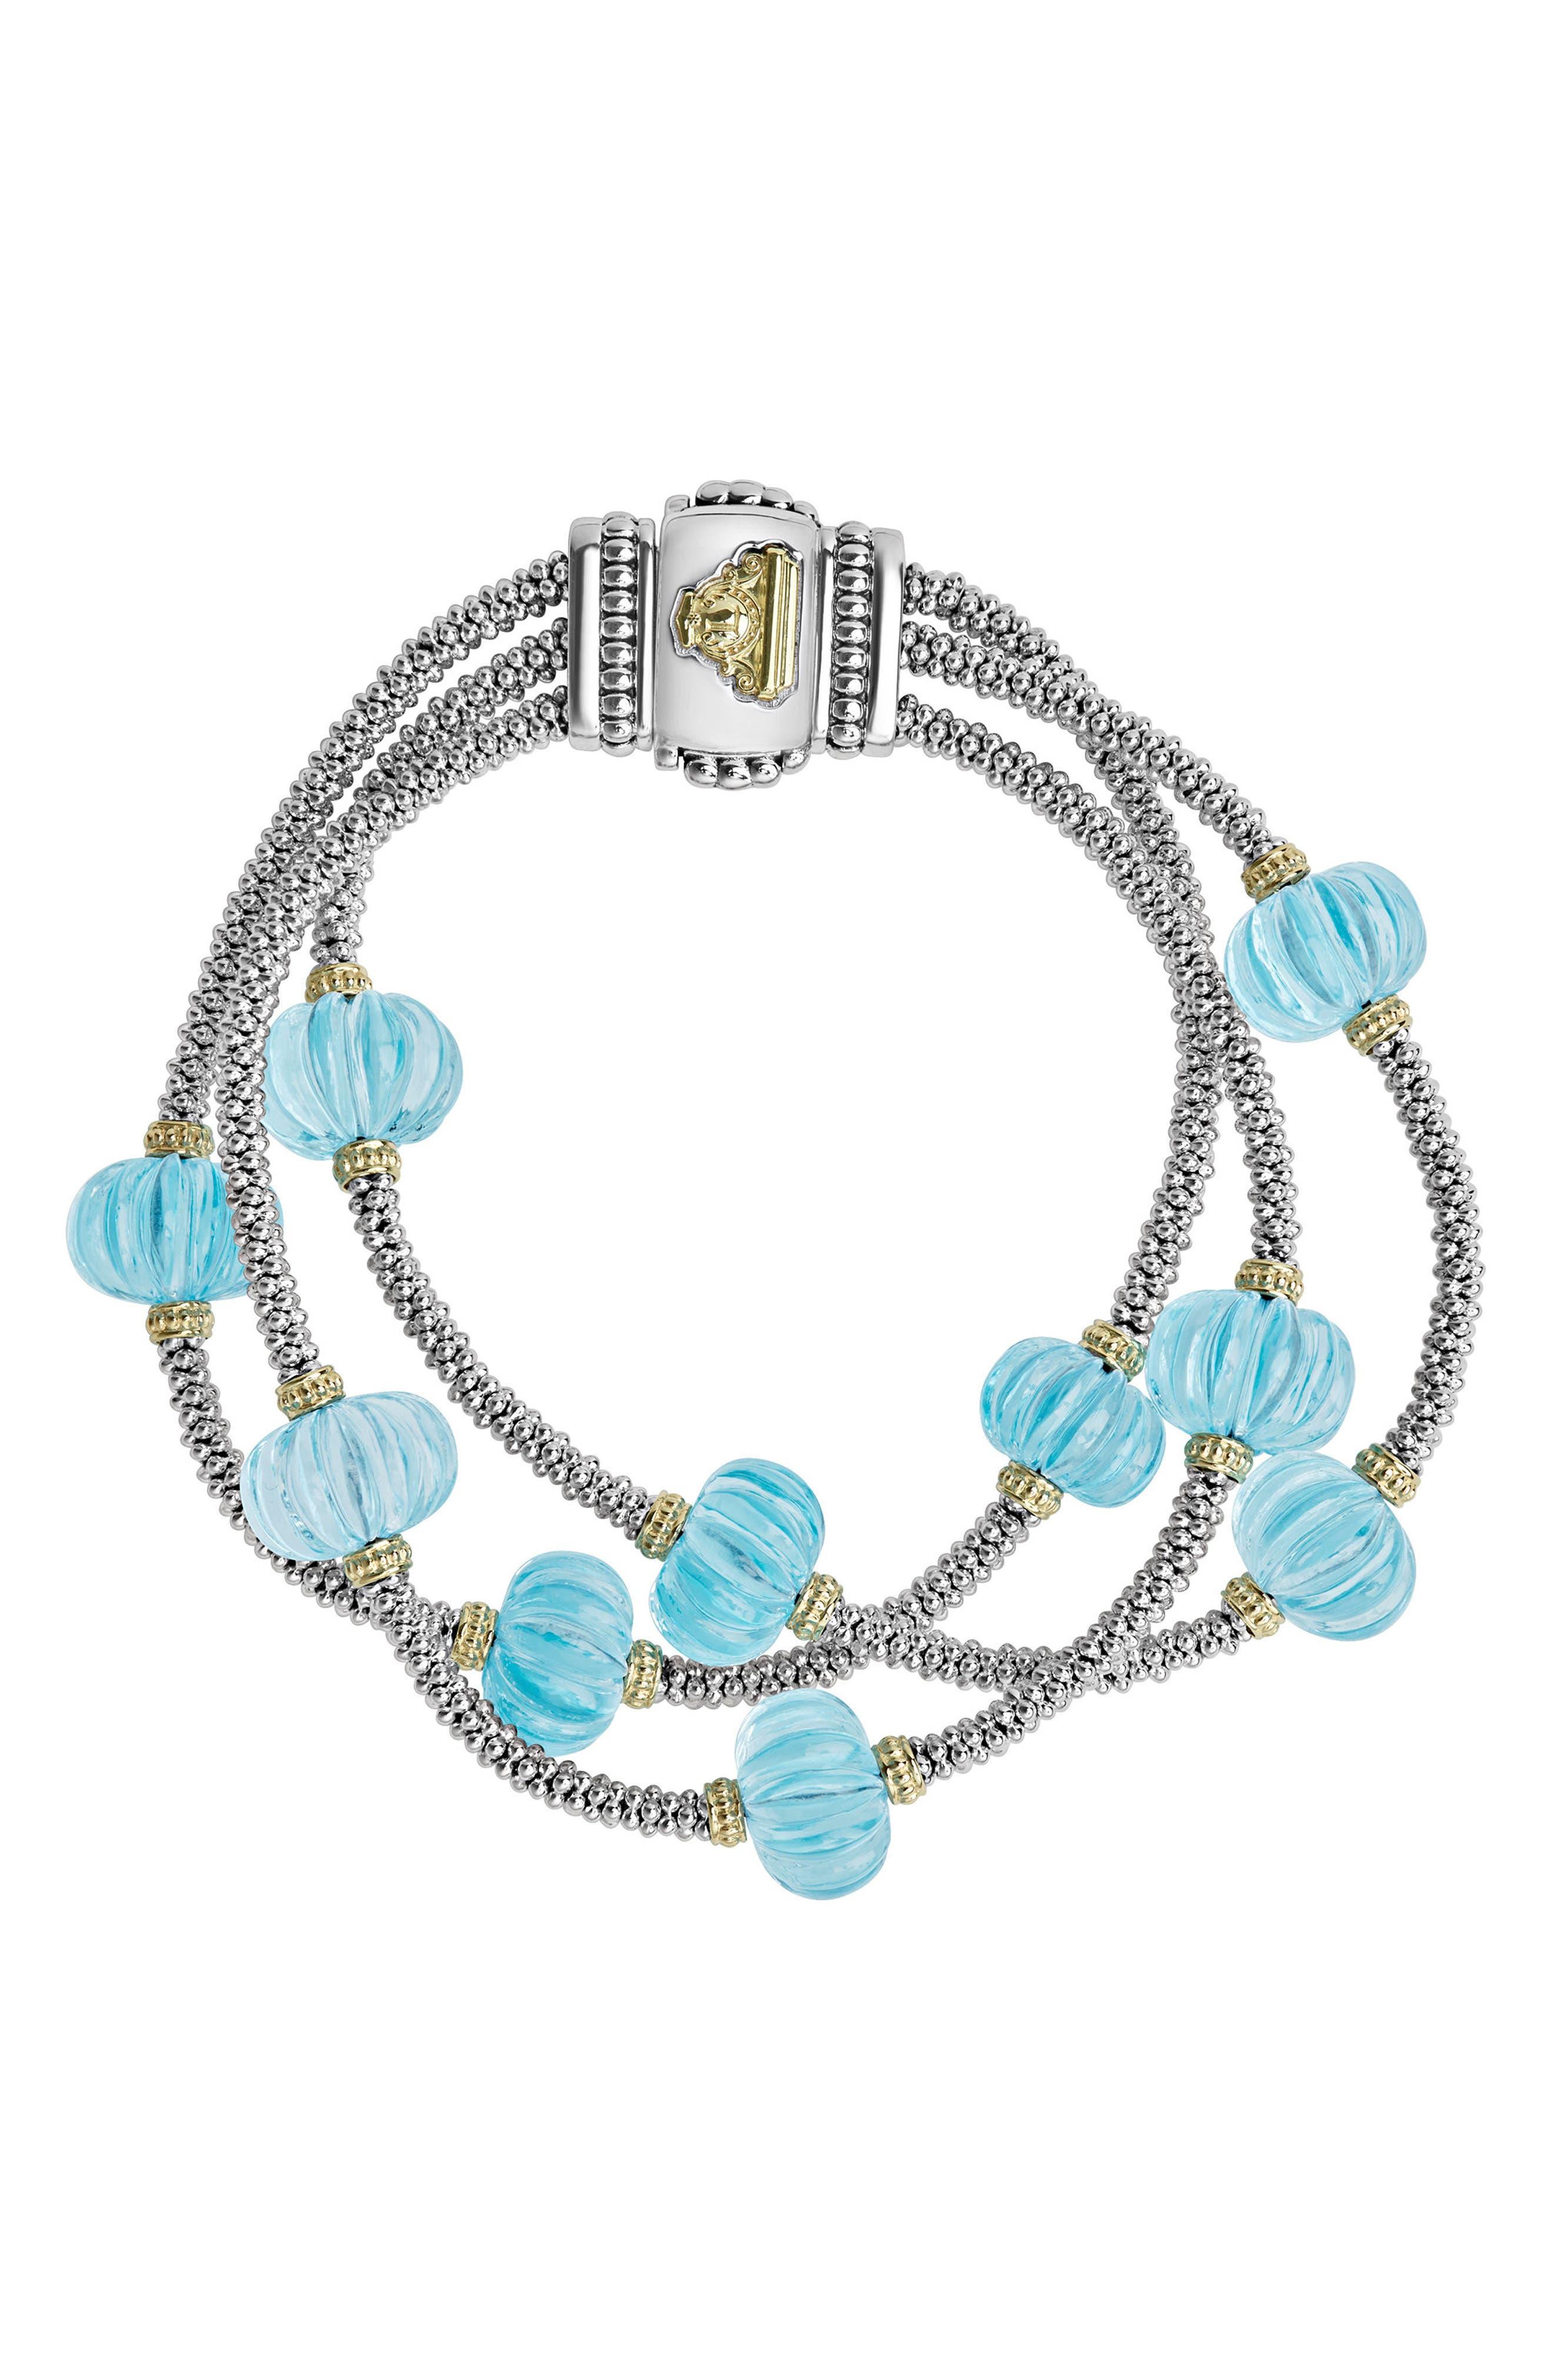 Caviar Forever Triple Strand Melon Bead Bracelet,                         Main,                         color, Silver/ Sky Blue Topaz